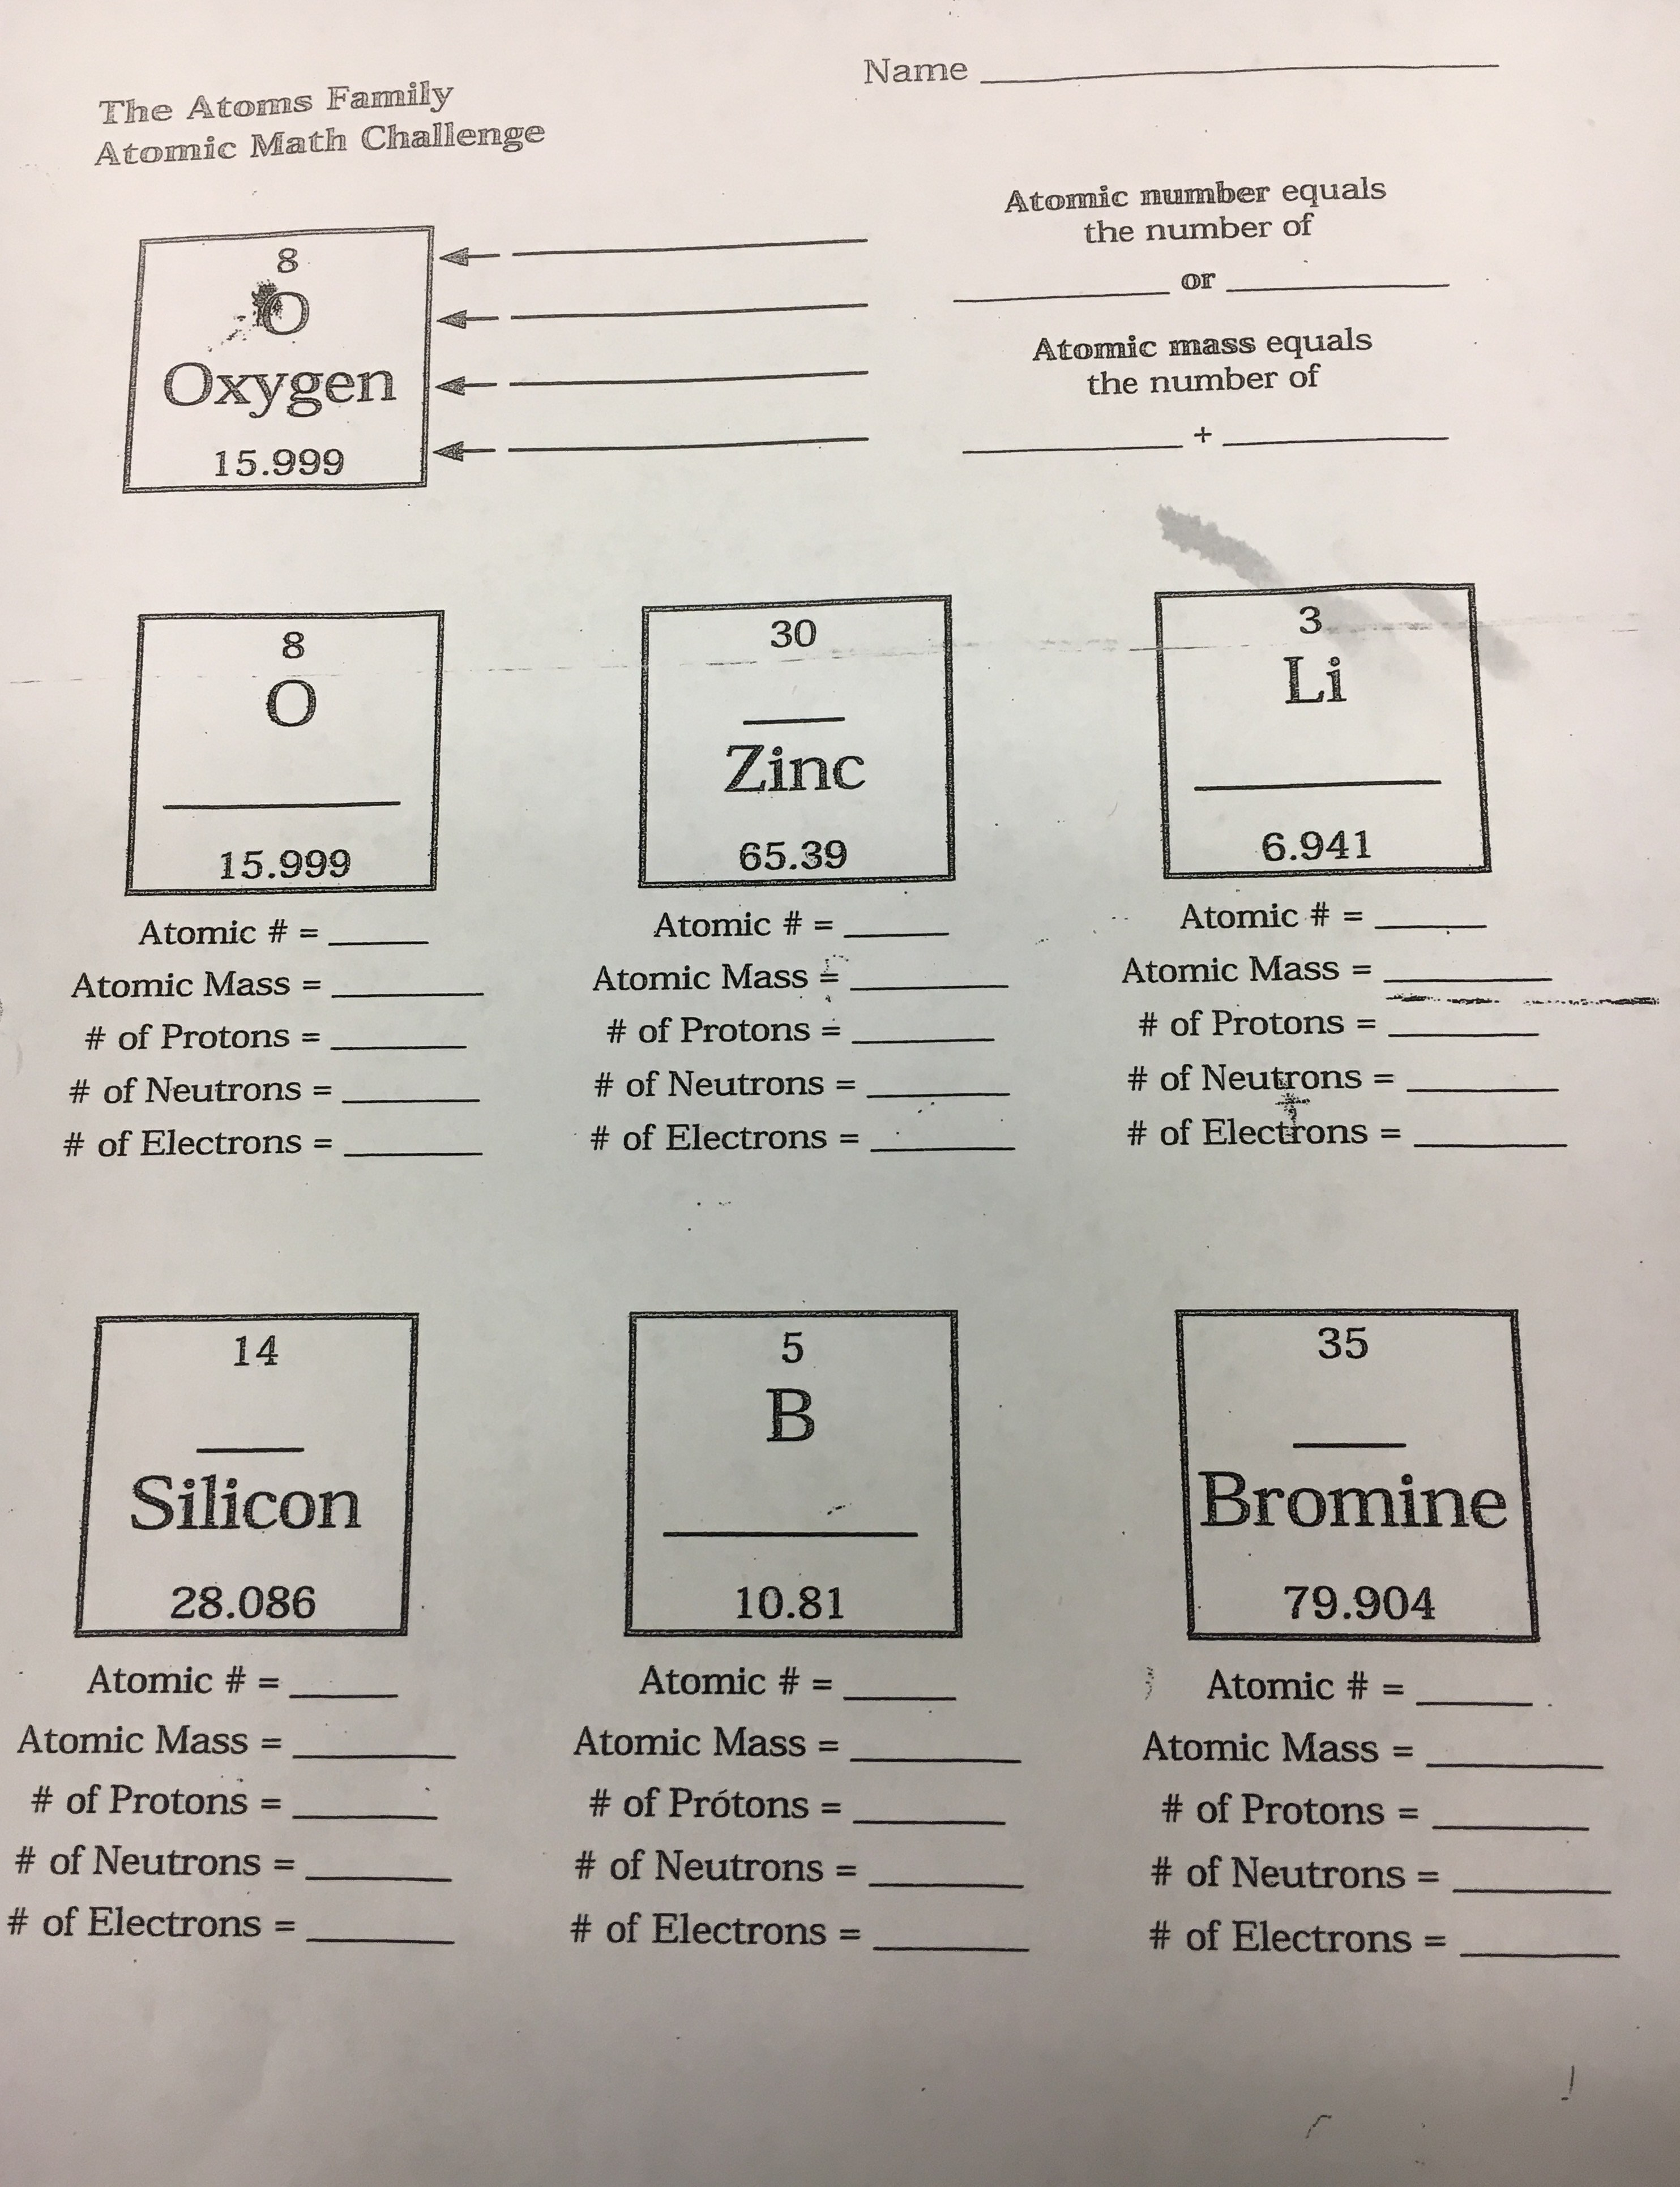 Magnificent Atomic Math Worksheet Answer Key Image - Math Worksheets ...